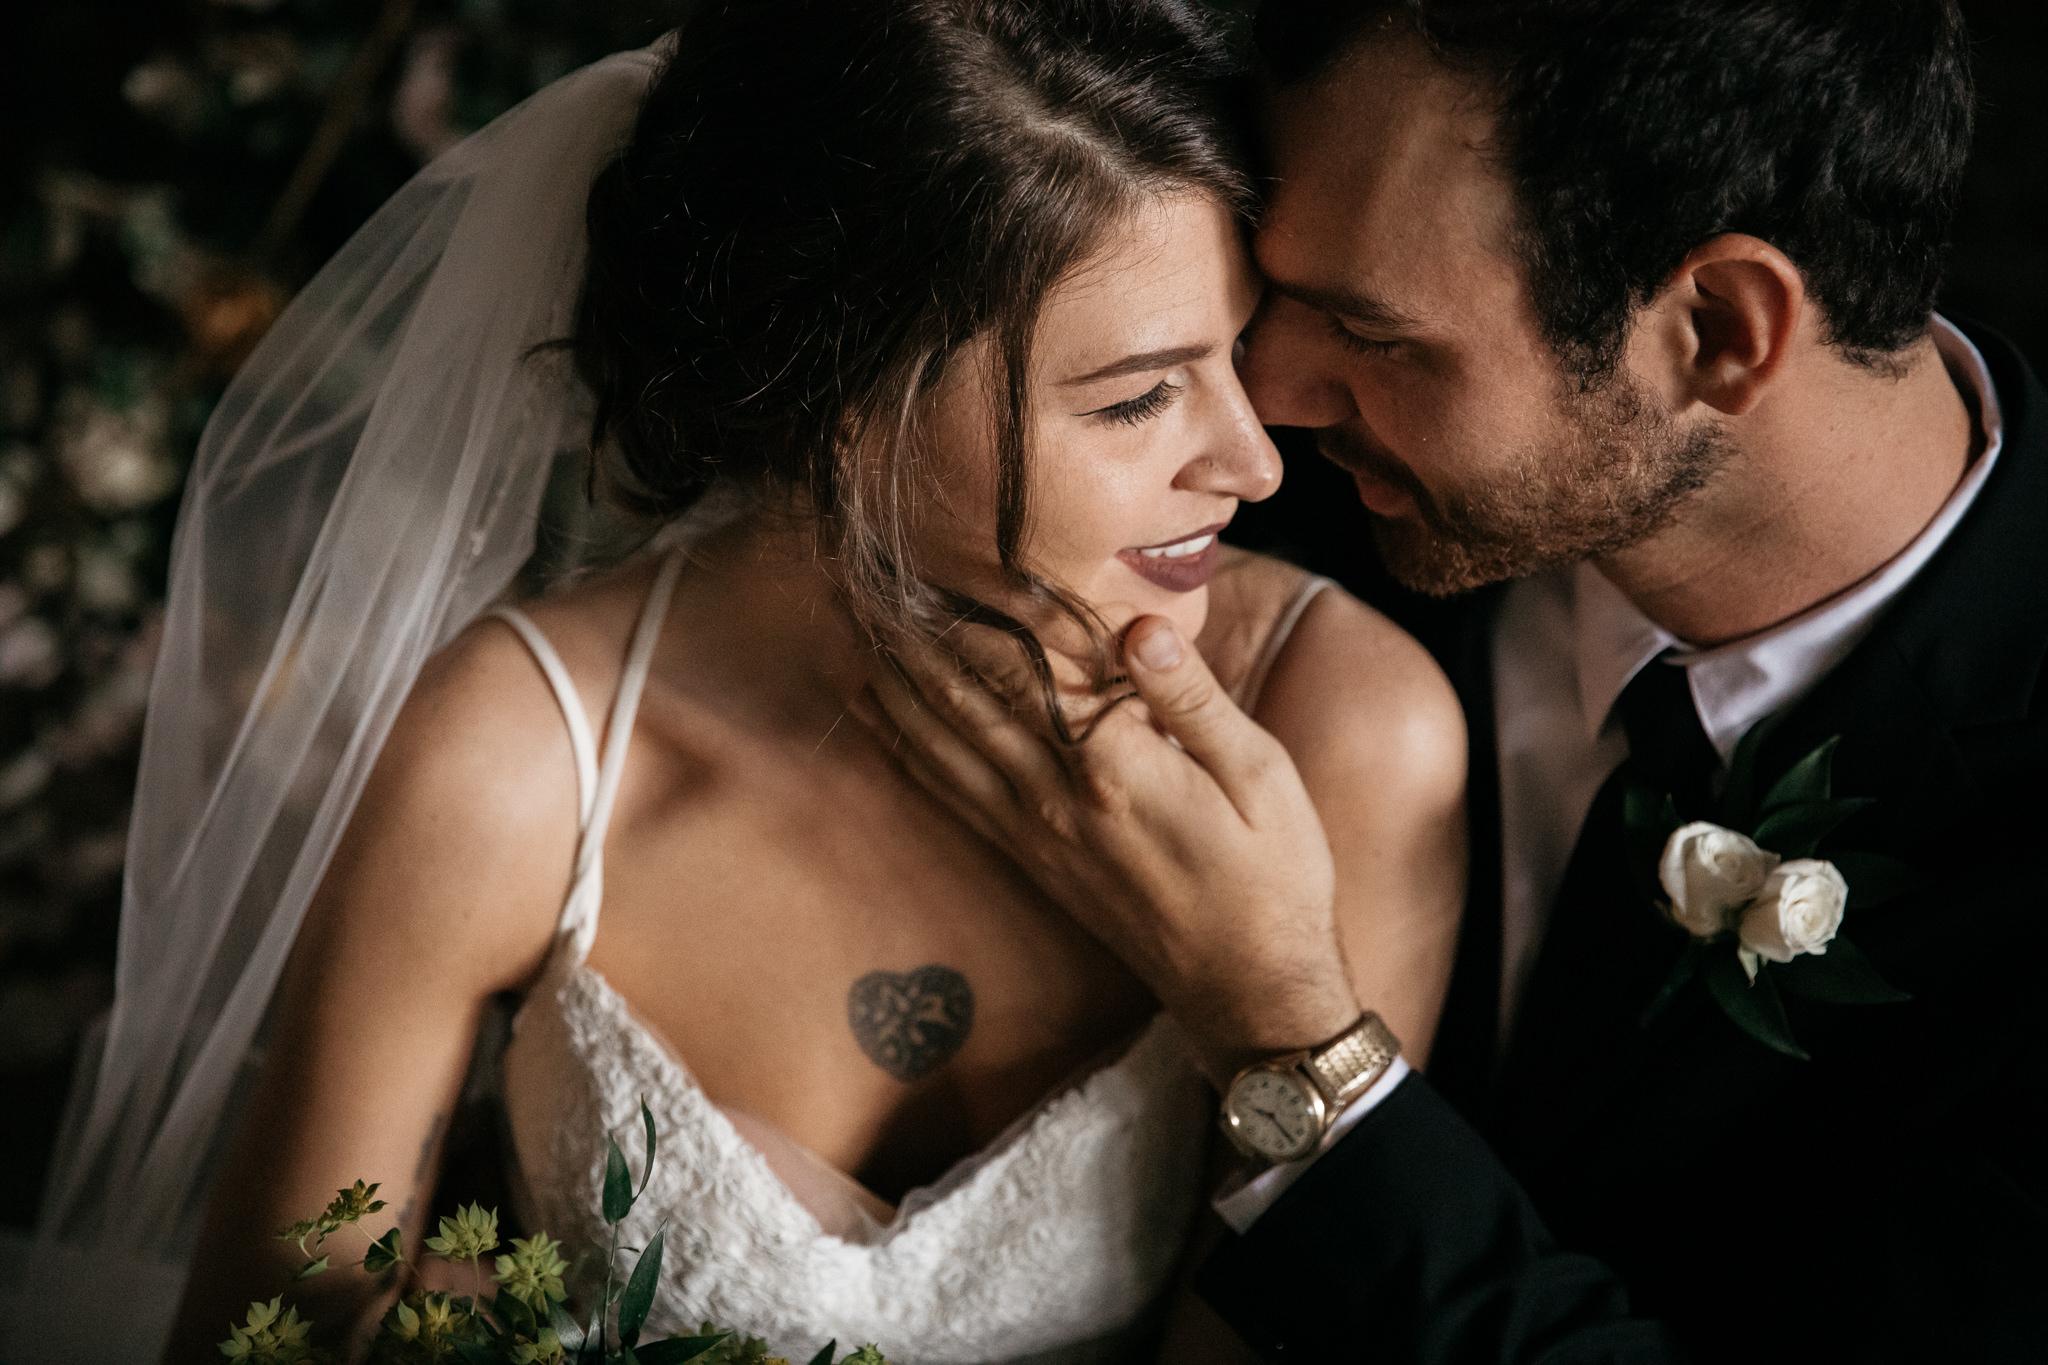 phantom-canyon-brewery-colorado-springs-wedding-photographer-288.jpg